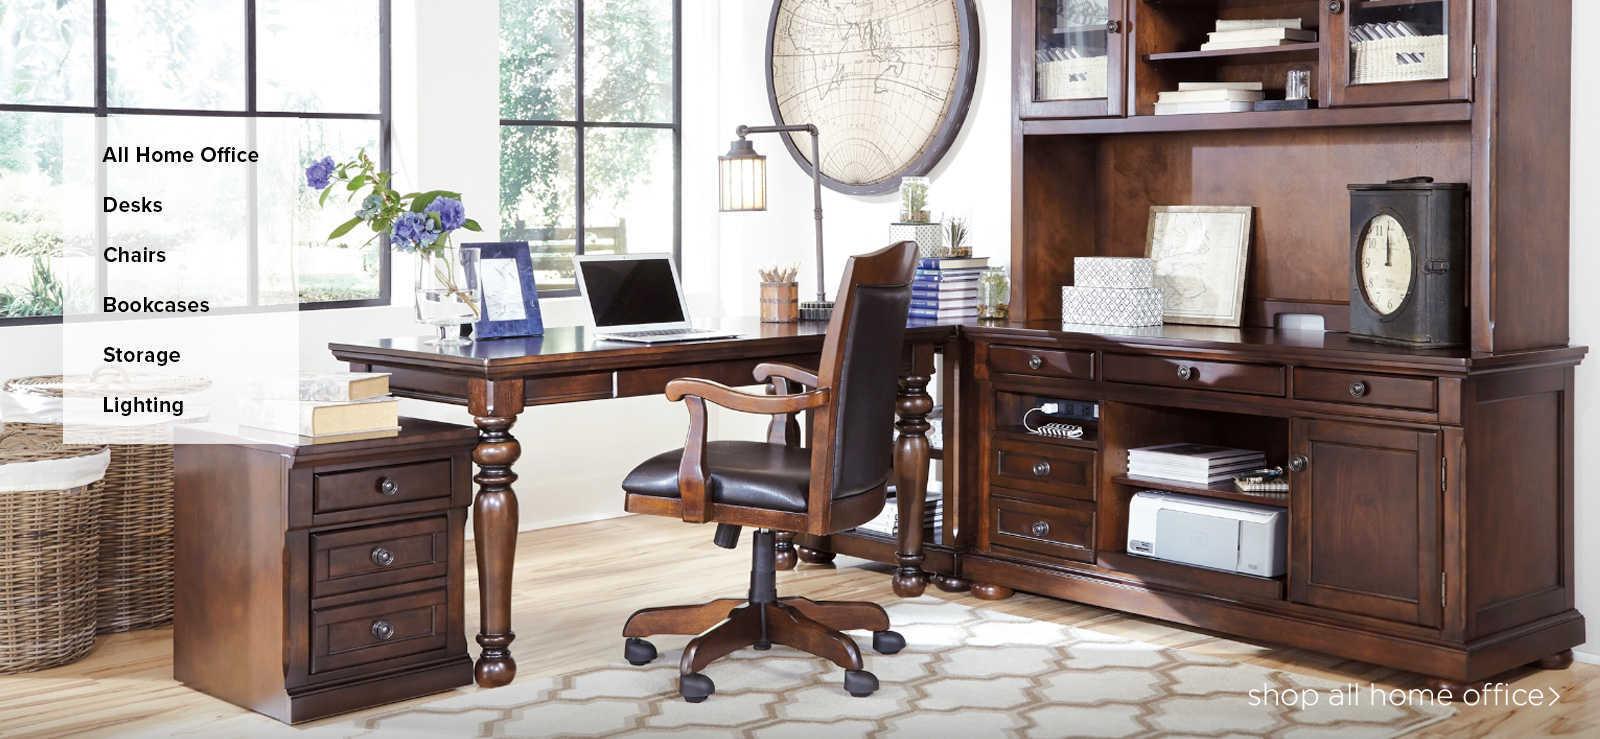 Amazing Home Office. Shop Desks desk tables home office